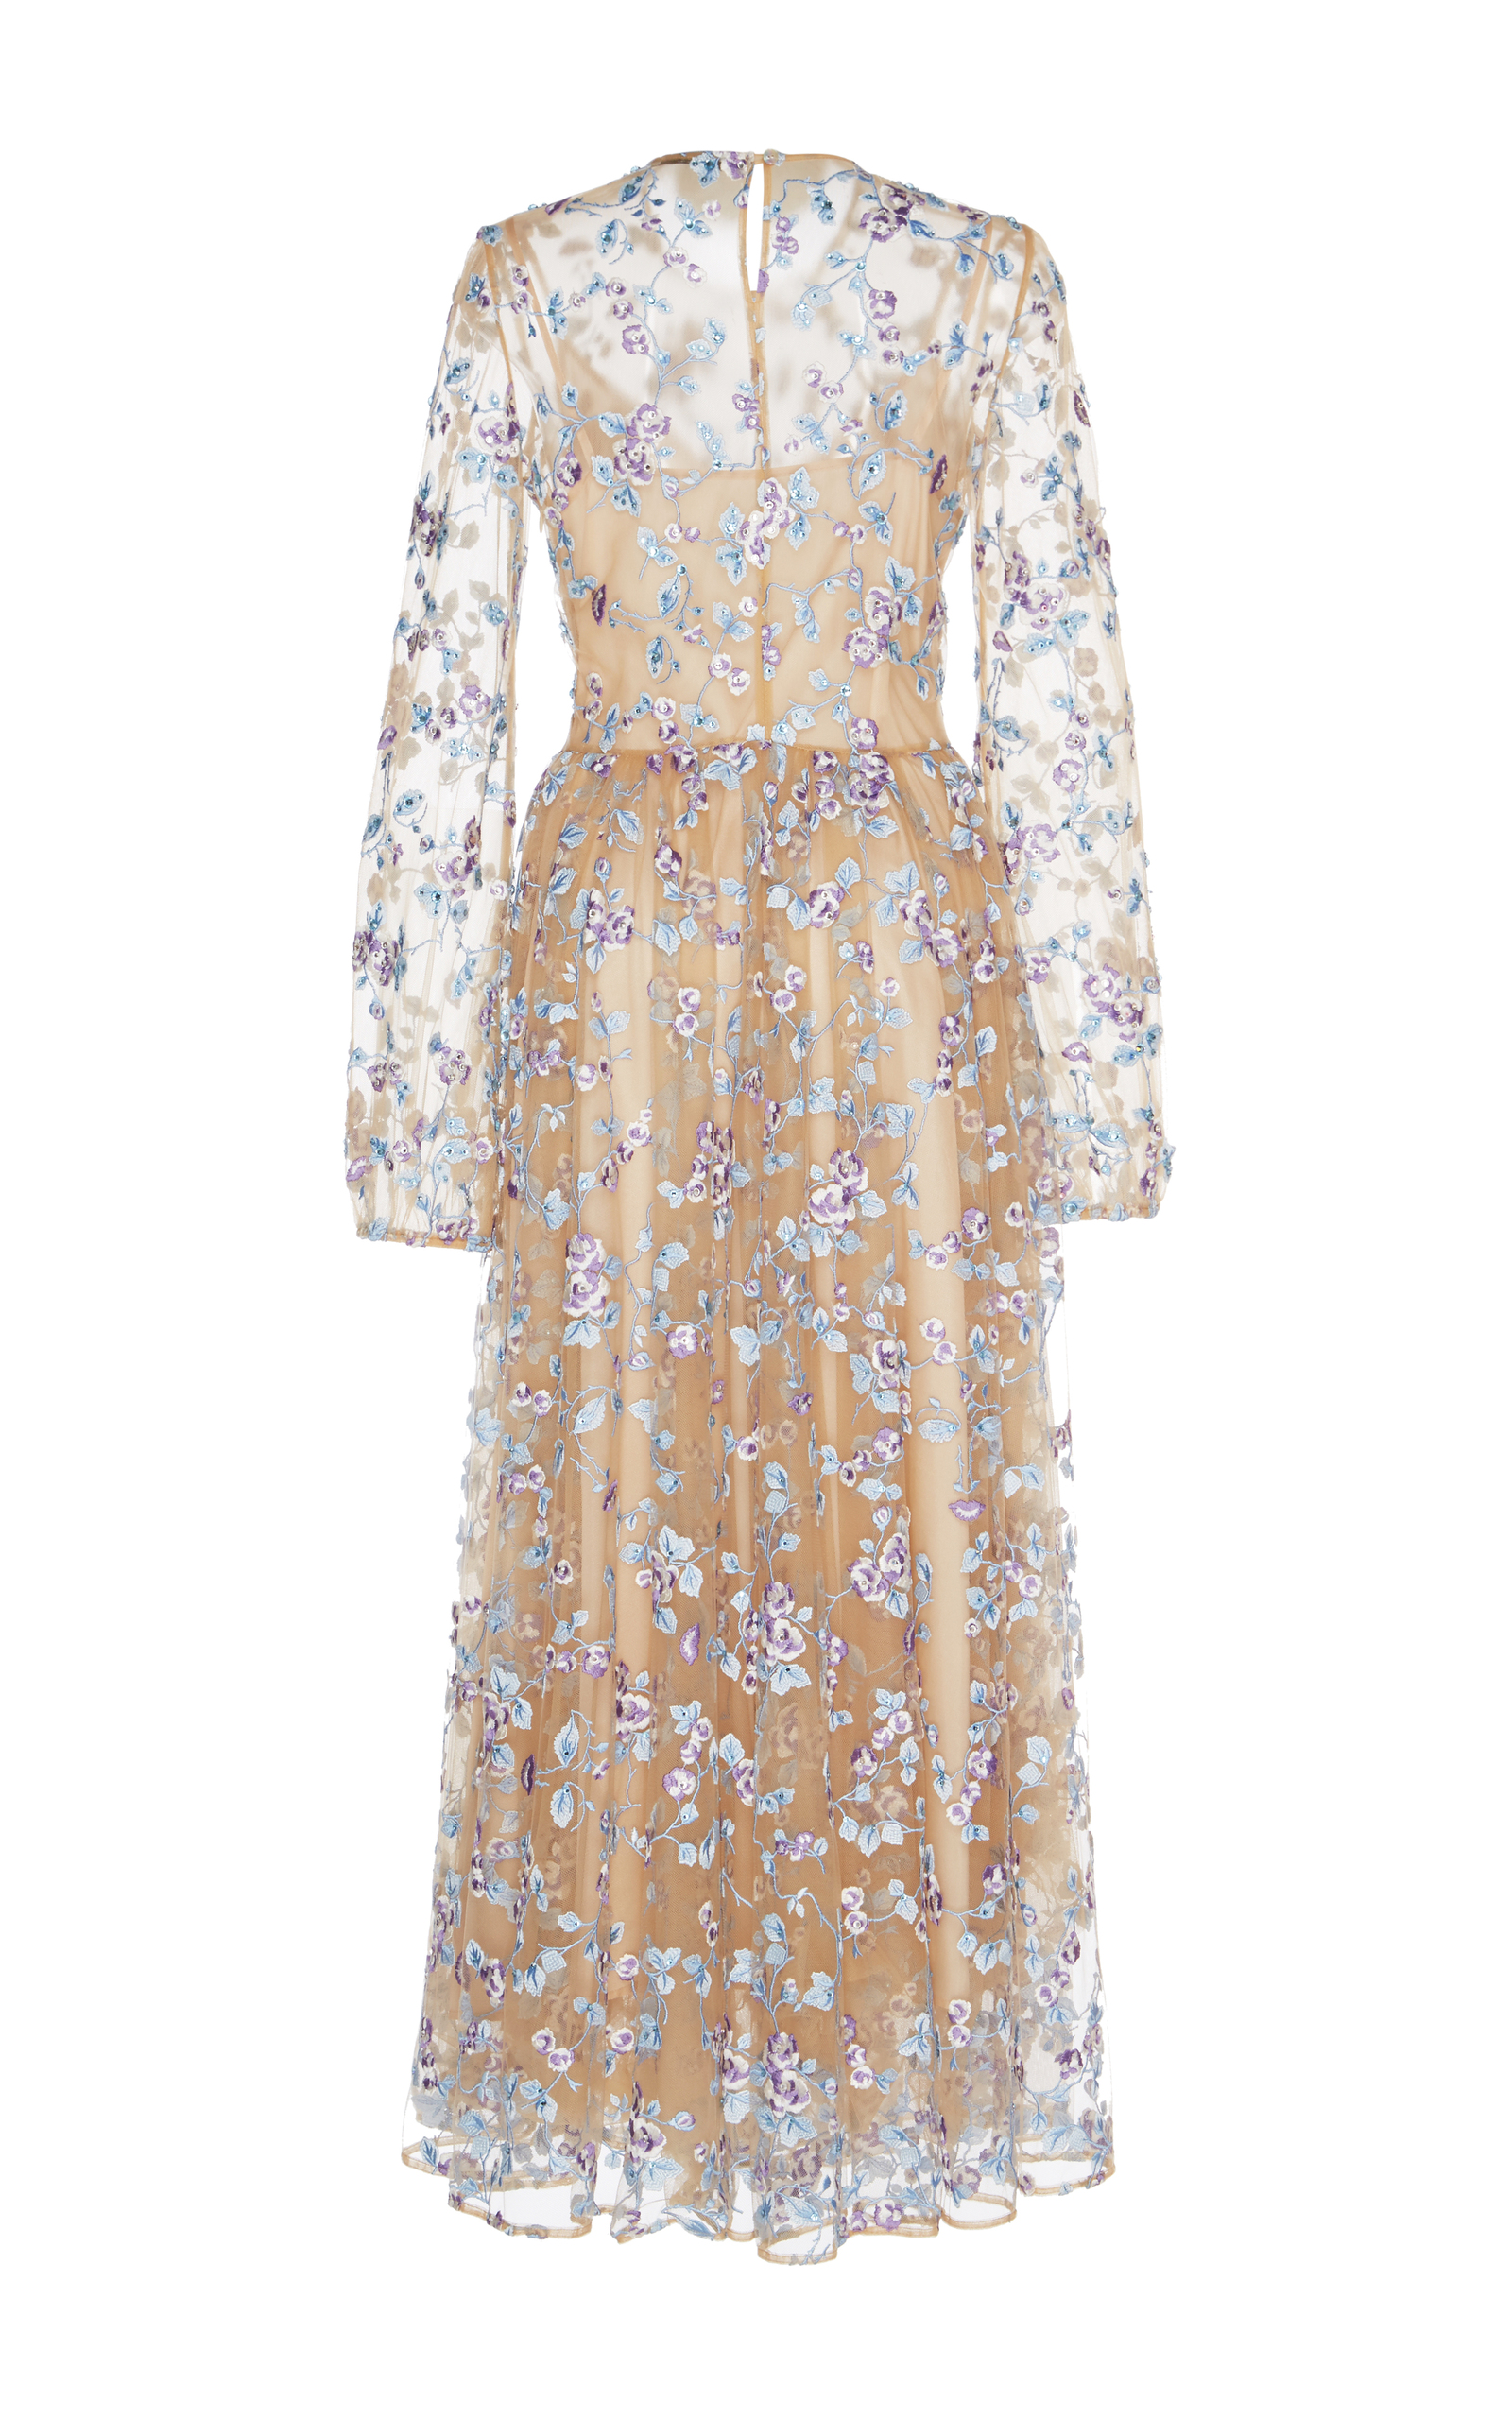 Port Moresby Sheer Embroidered Dress by Vivetta | Moda Operandi